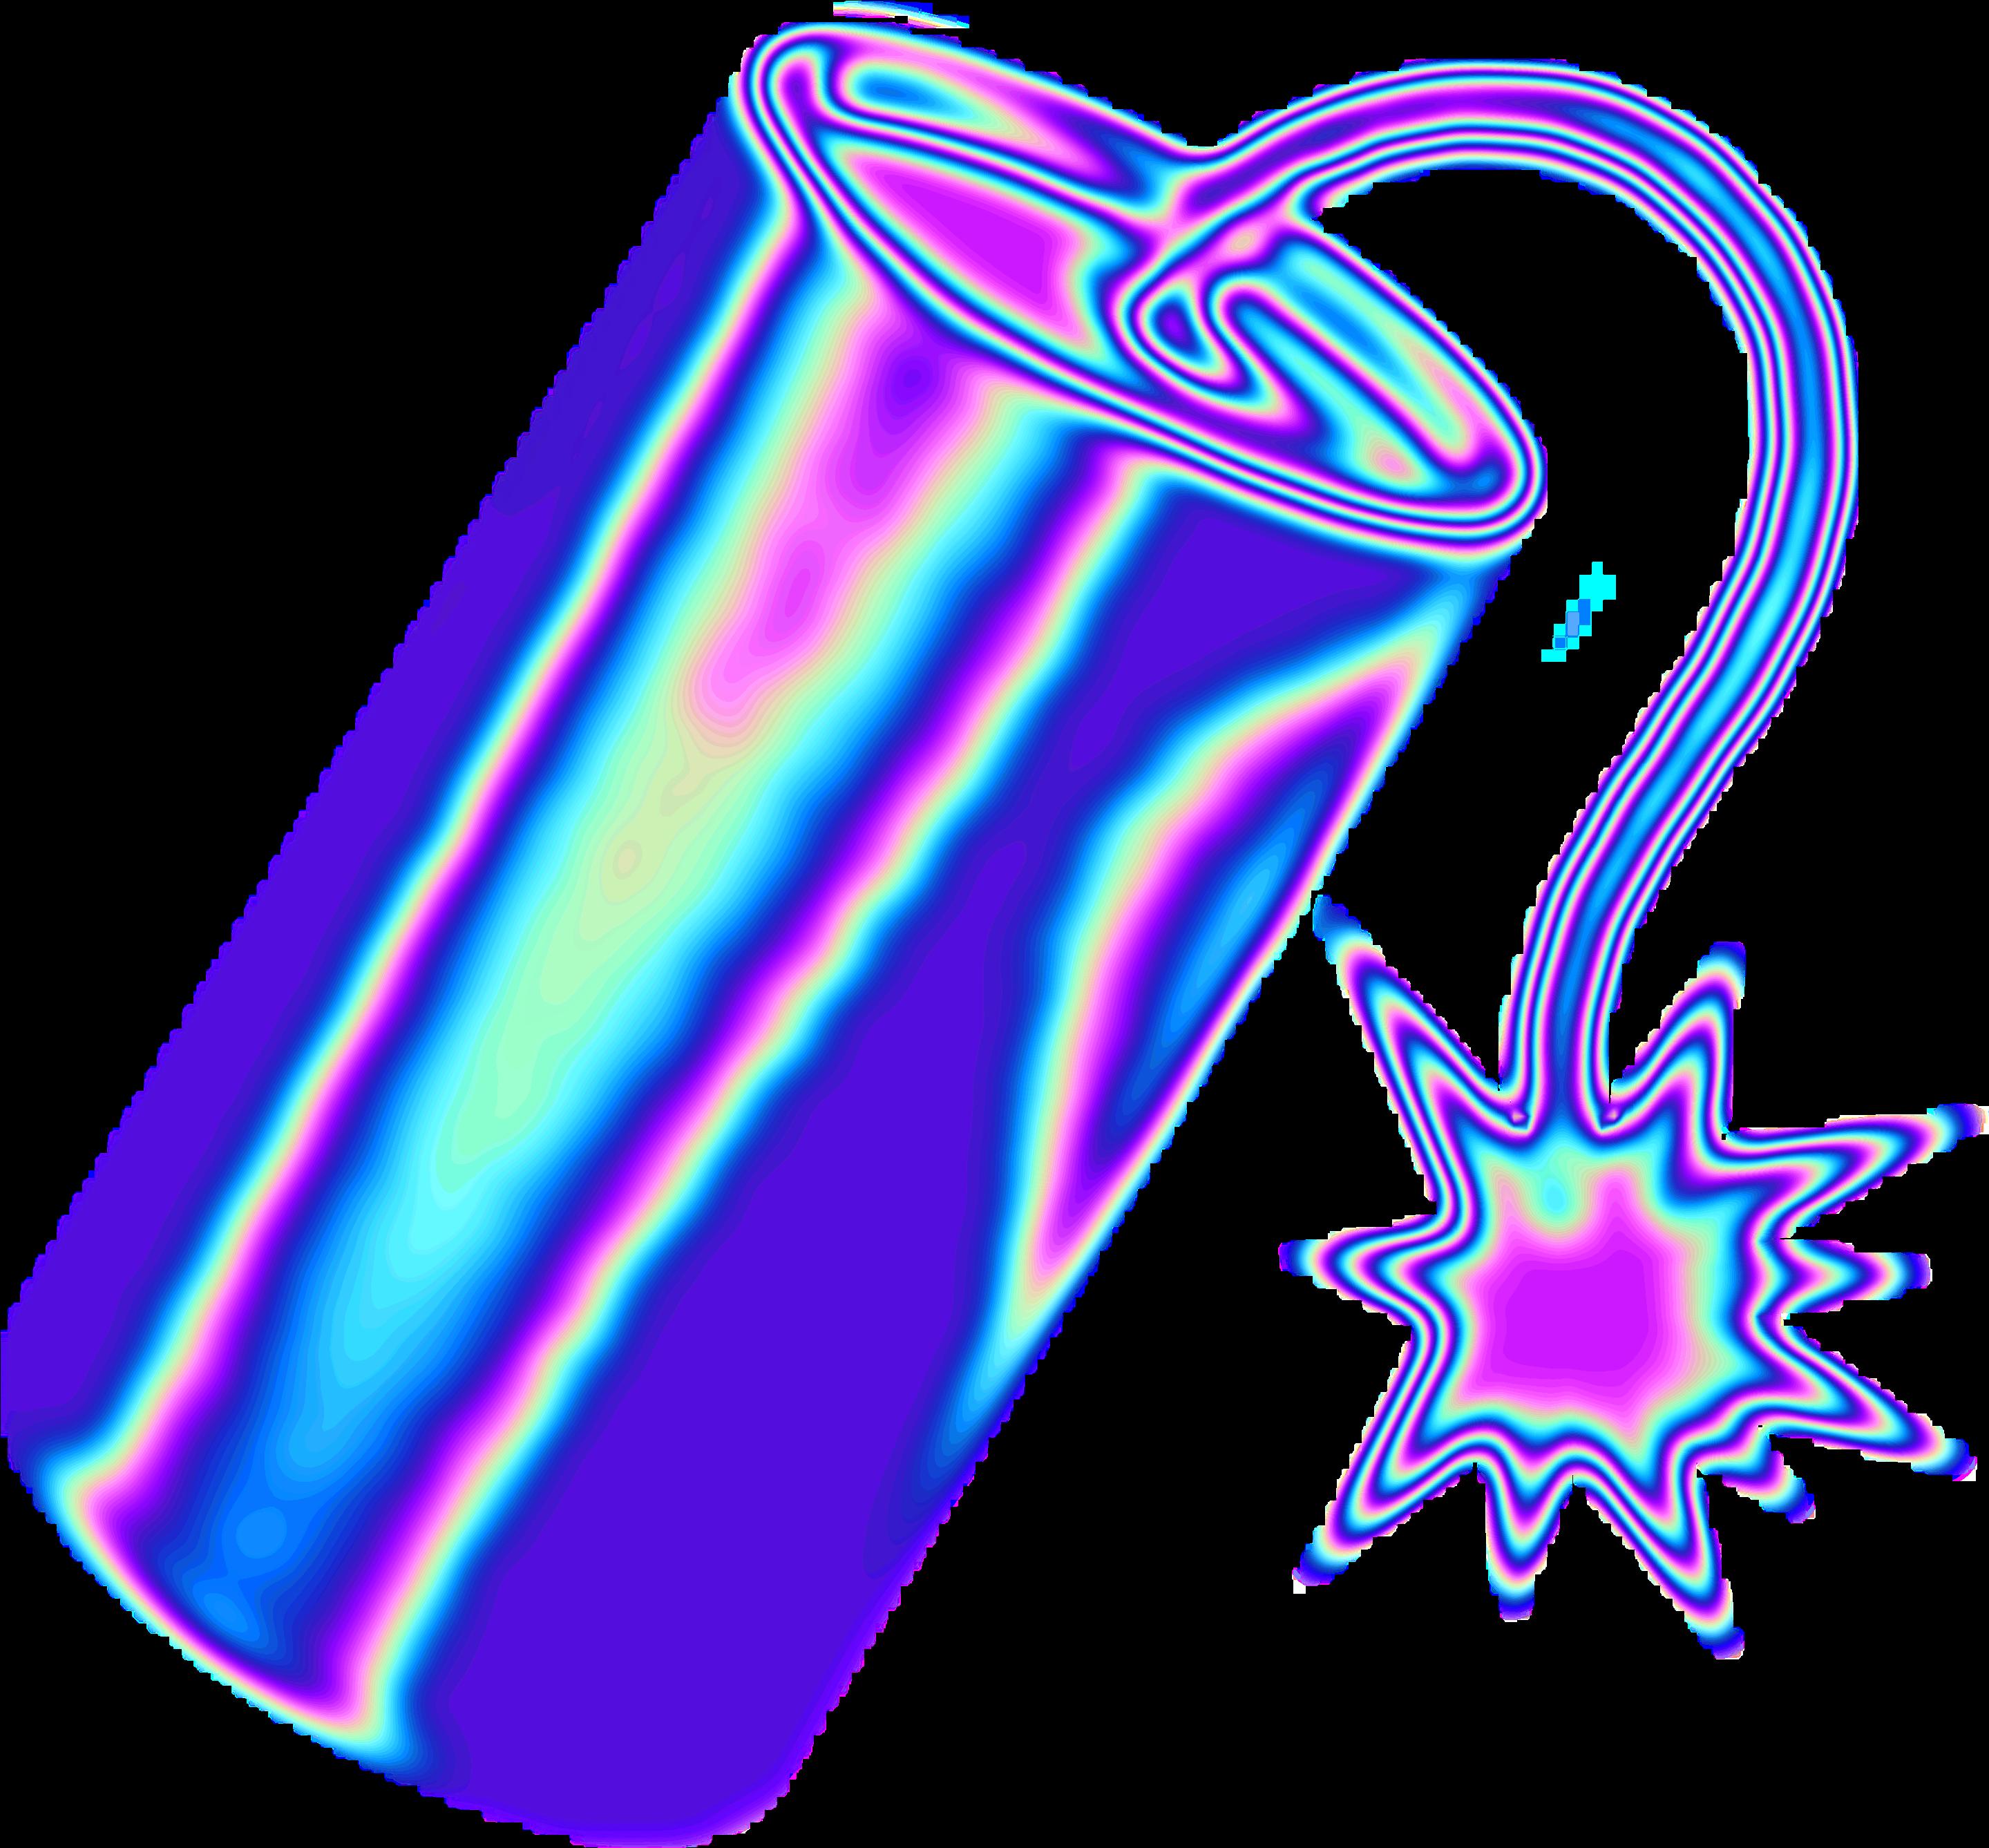 Transparent dynamite clip art - #dynamite #aesthetic #background #color #dream #emoji - Dynamite Aesthetic